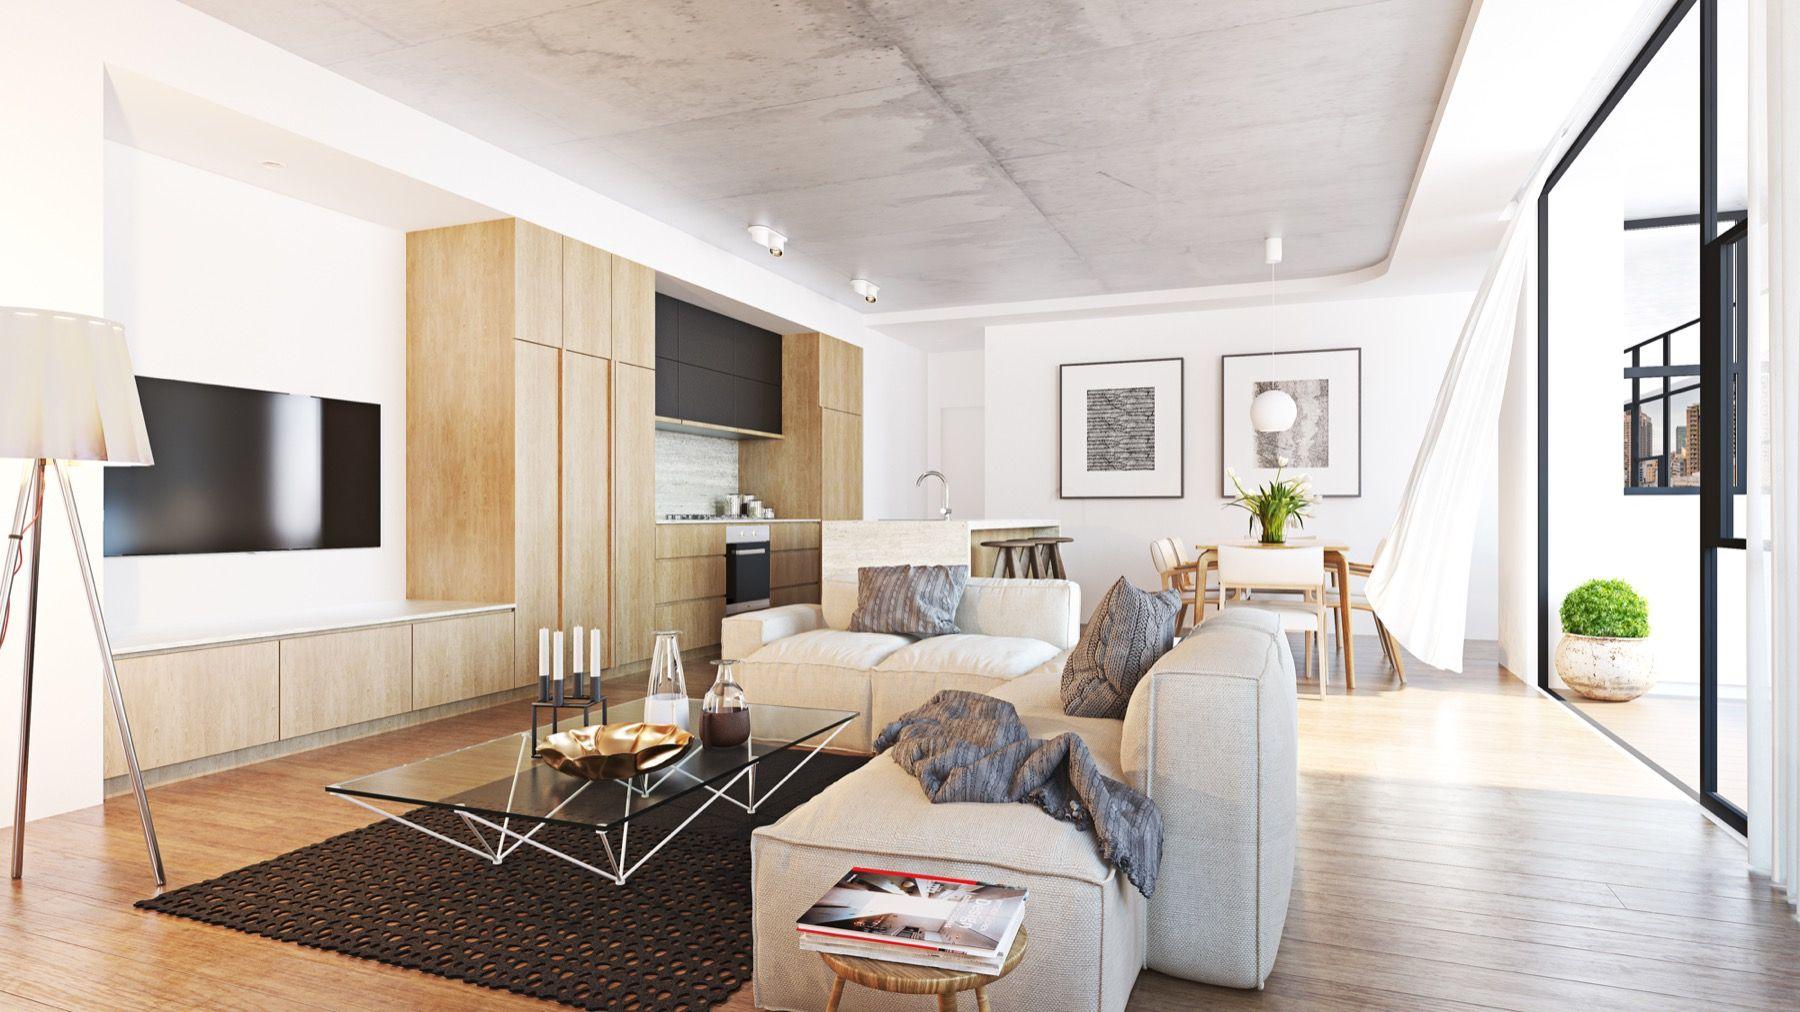 Binyan studios architectural visualisation